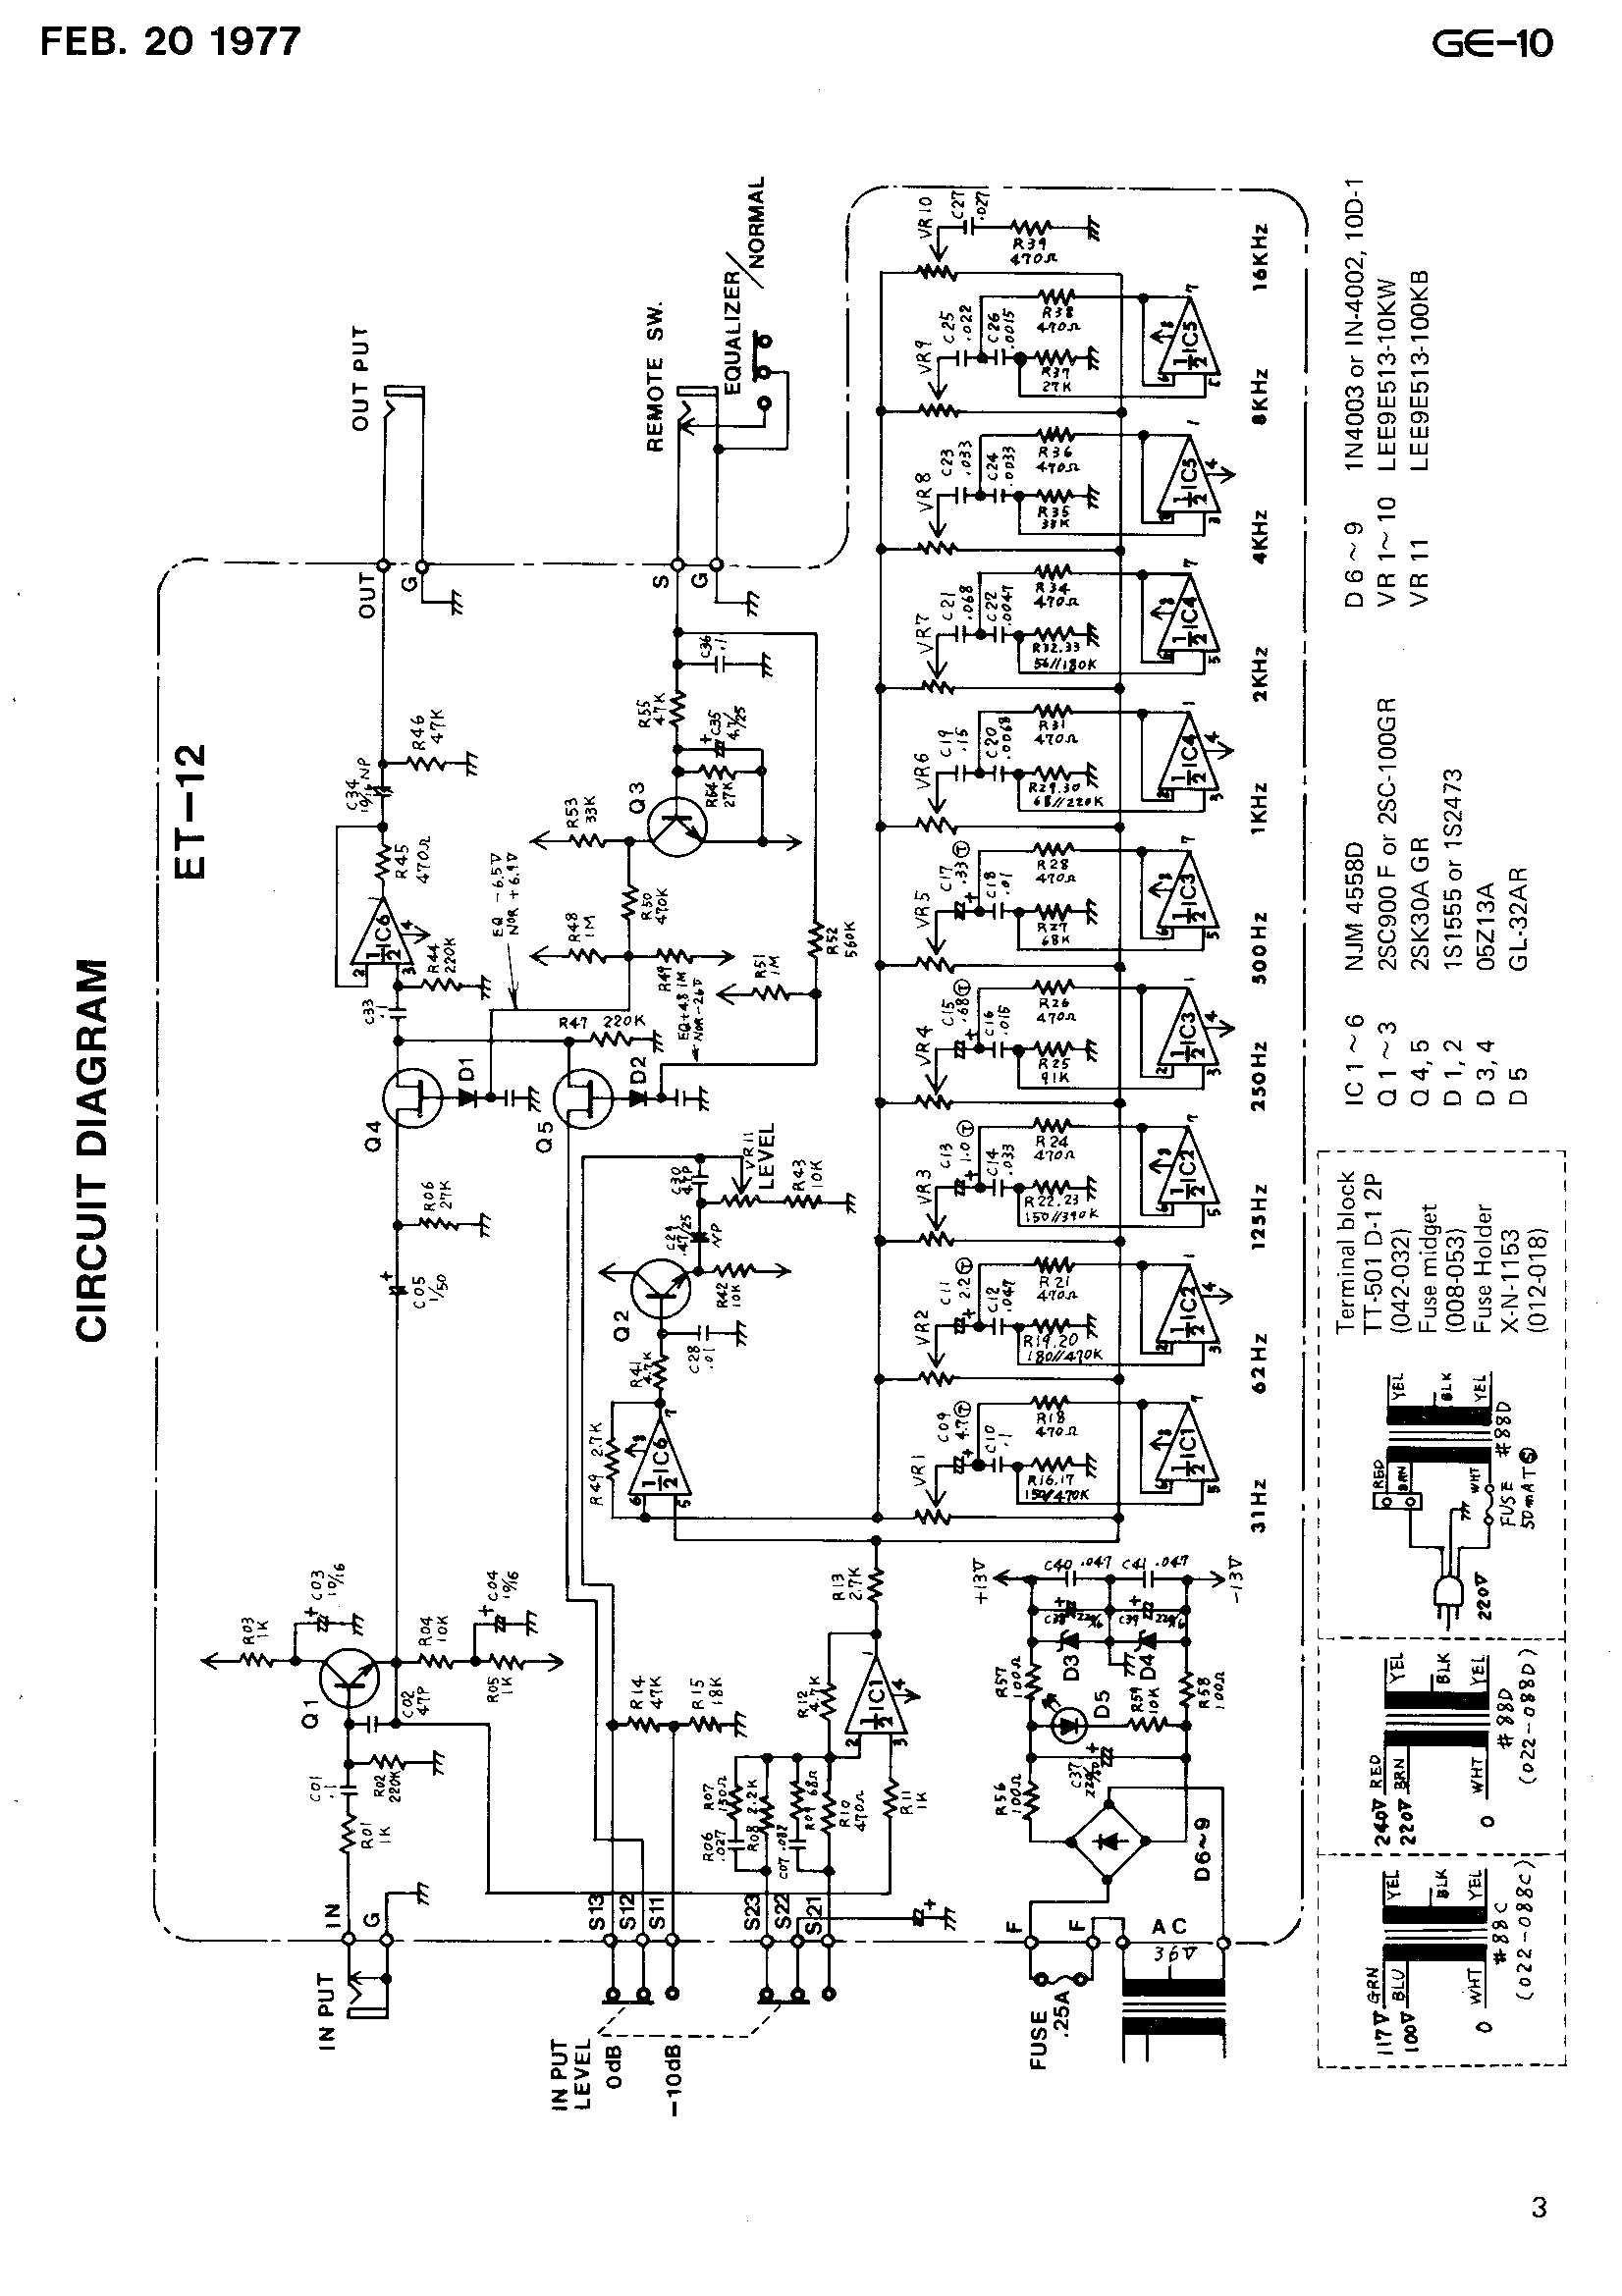 hight resolution of note 3 circuit diagram wiring diagram mega galaxy note 3 block diagram